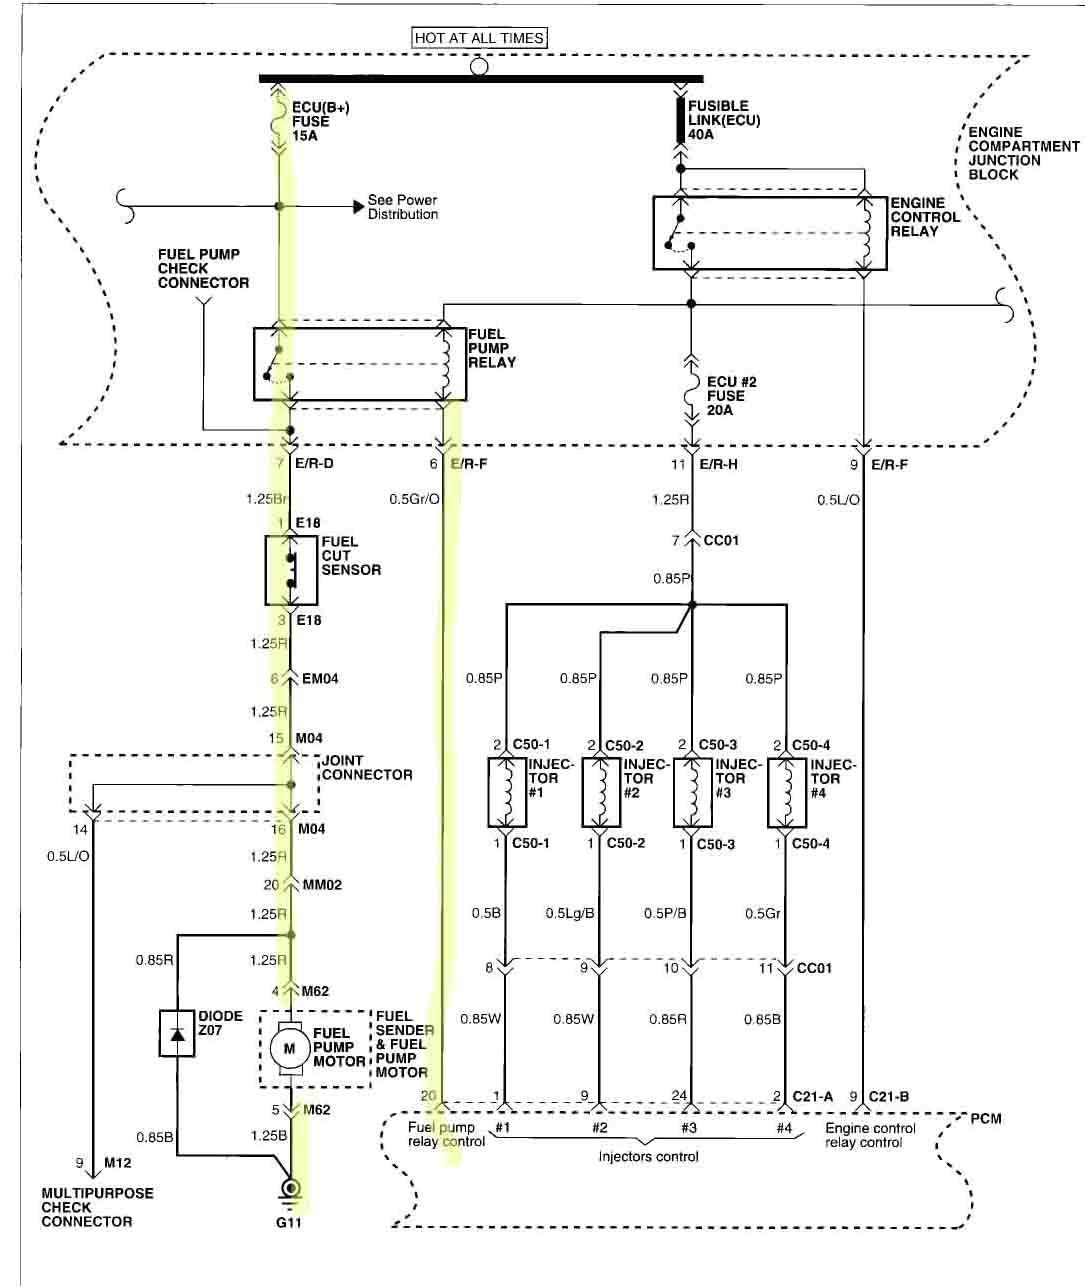 hyundai timing belt engine diagram a i have a hyundai santa fe 2 4l automatic the car